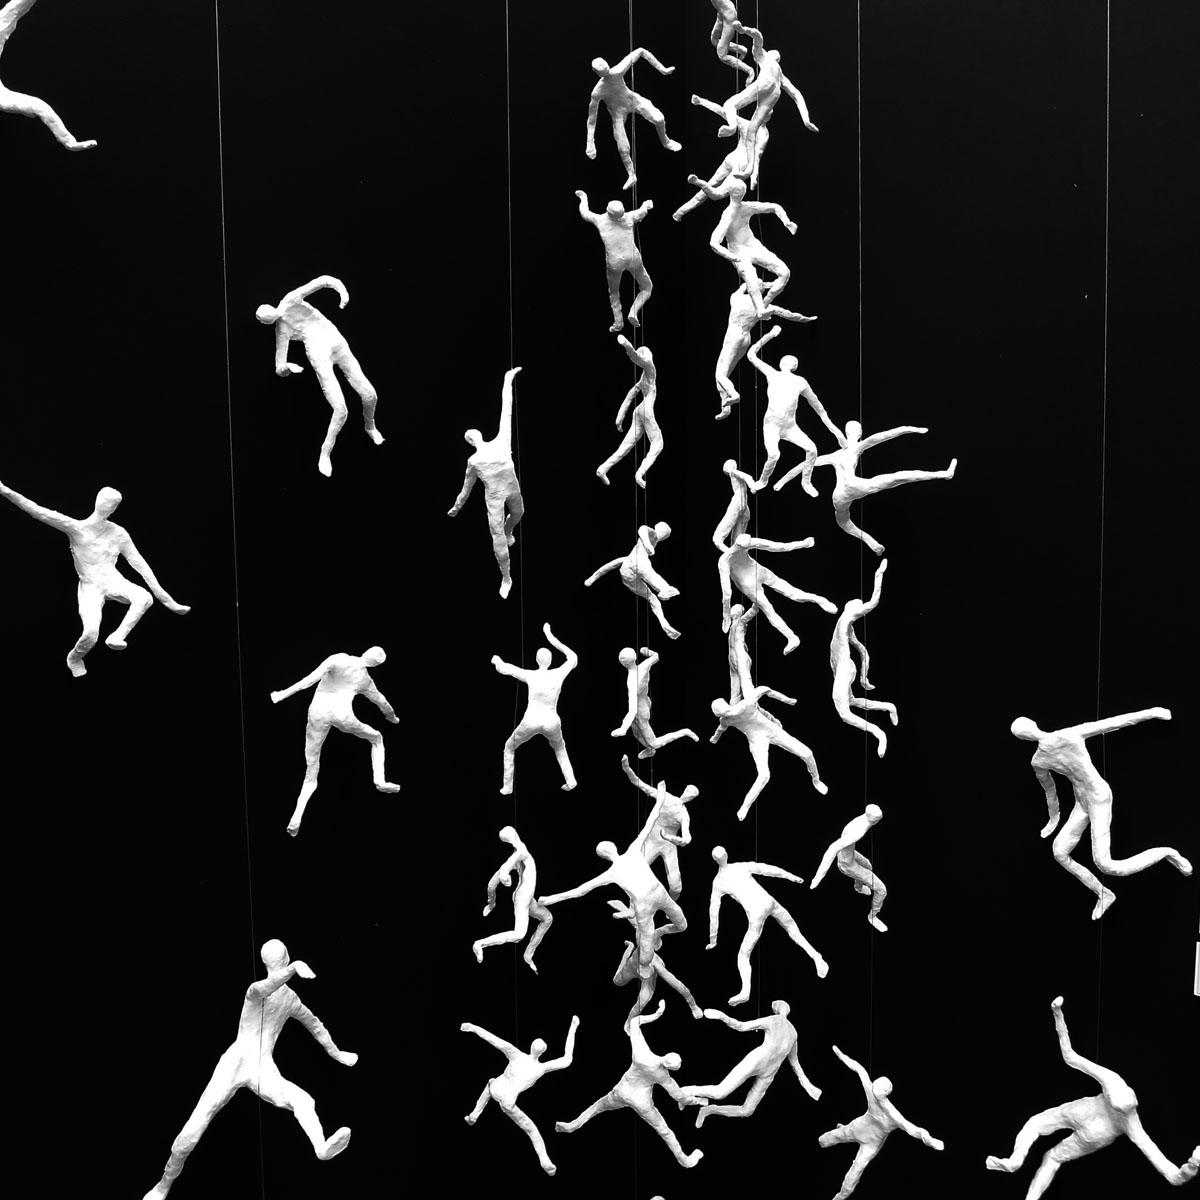 installation art Monaco 2014. 1.37M